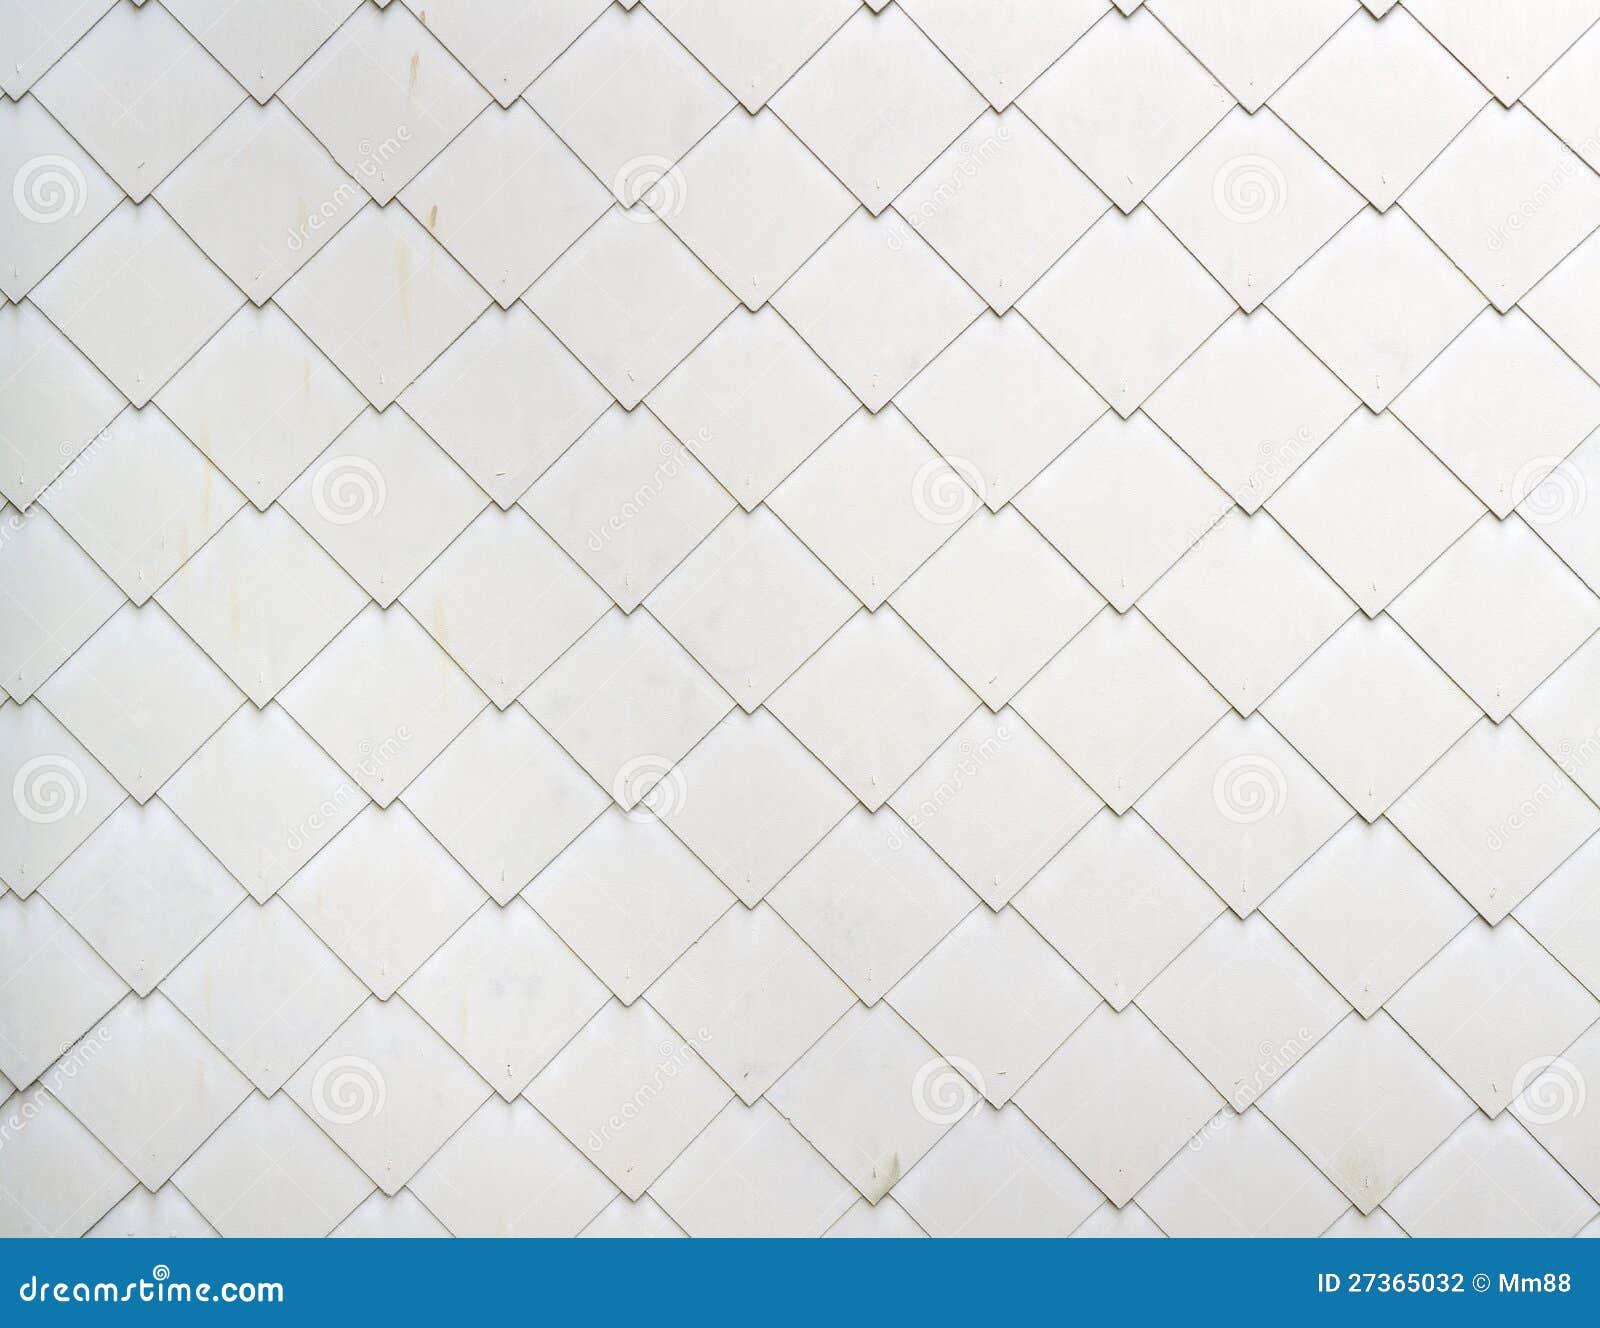 tuiles de fibrociment photographie stock image 27365032. Black Bedroom Furniture Sets. Home Design Ideas